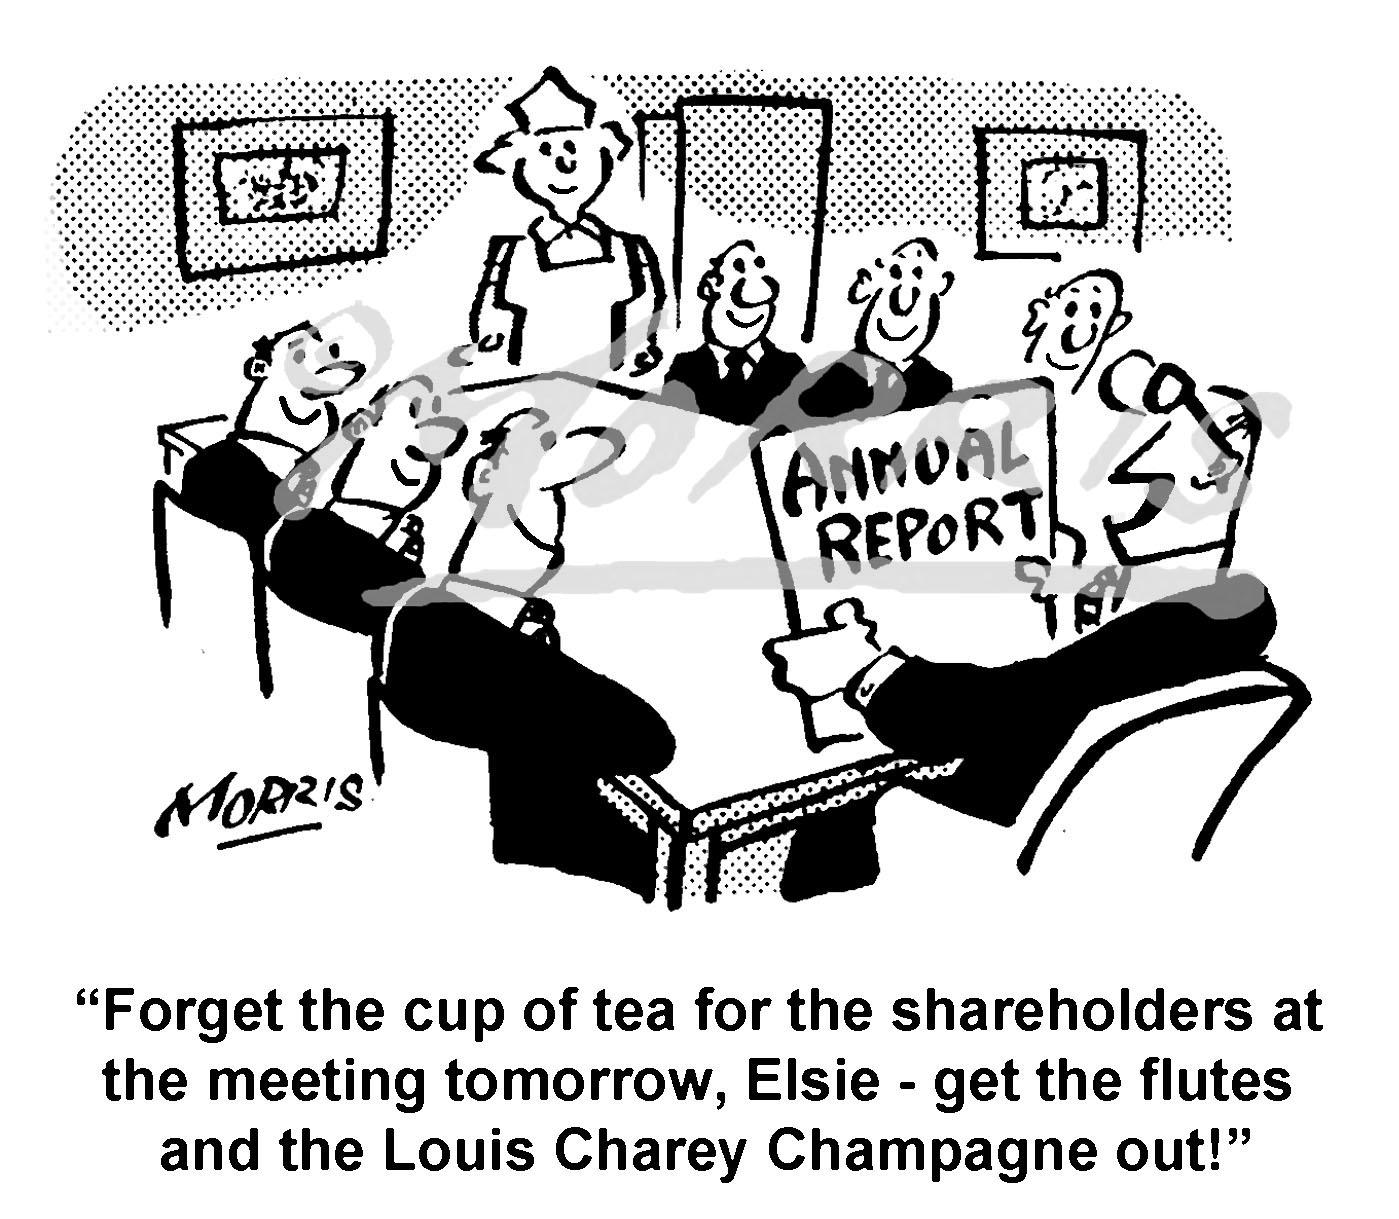 Boardroom meeting cartoon,  shareholders report cartoon Ref: 8611bw